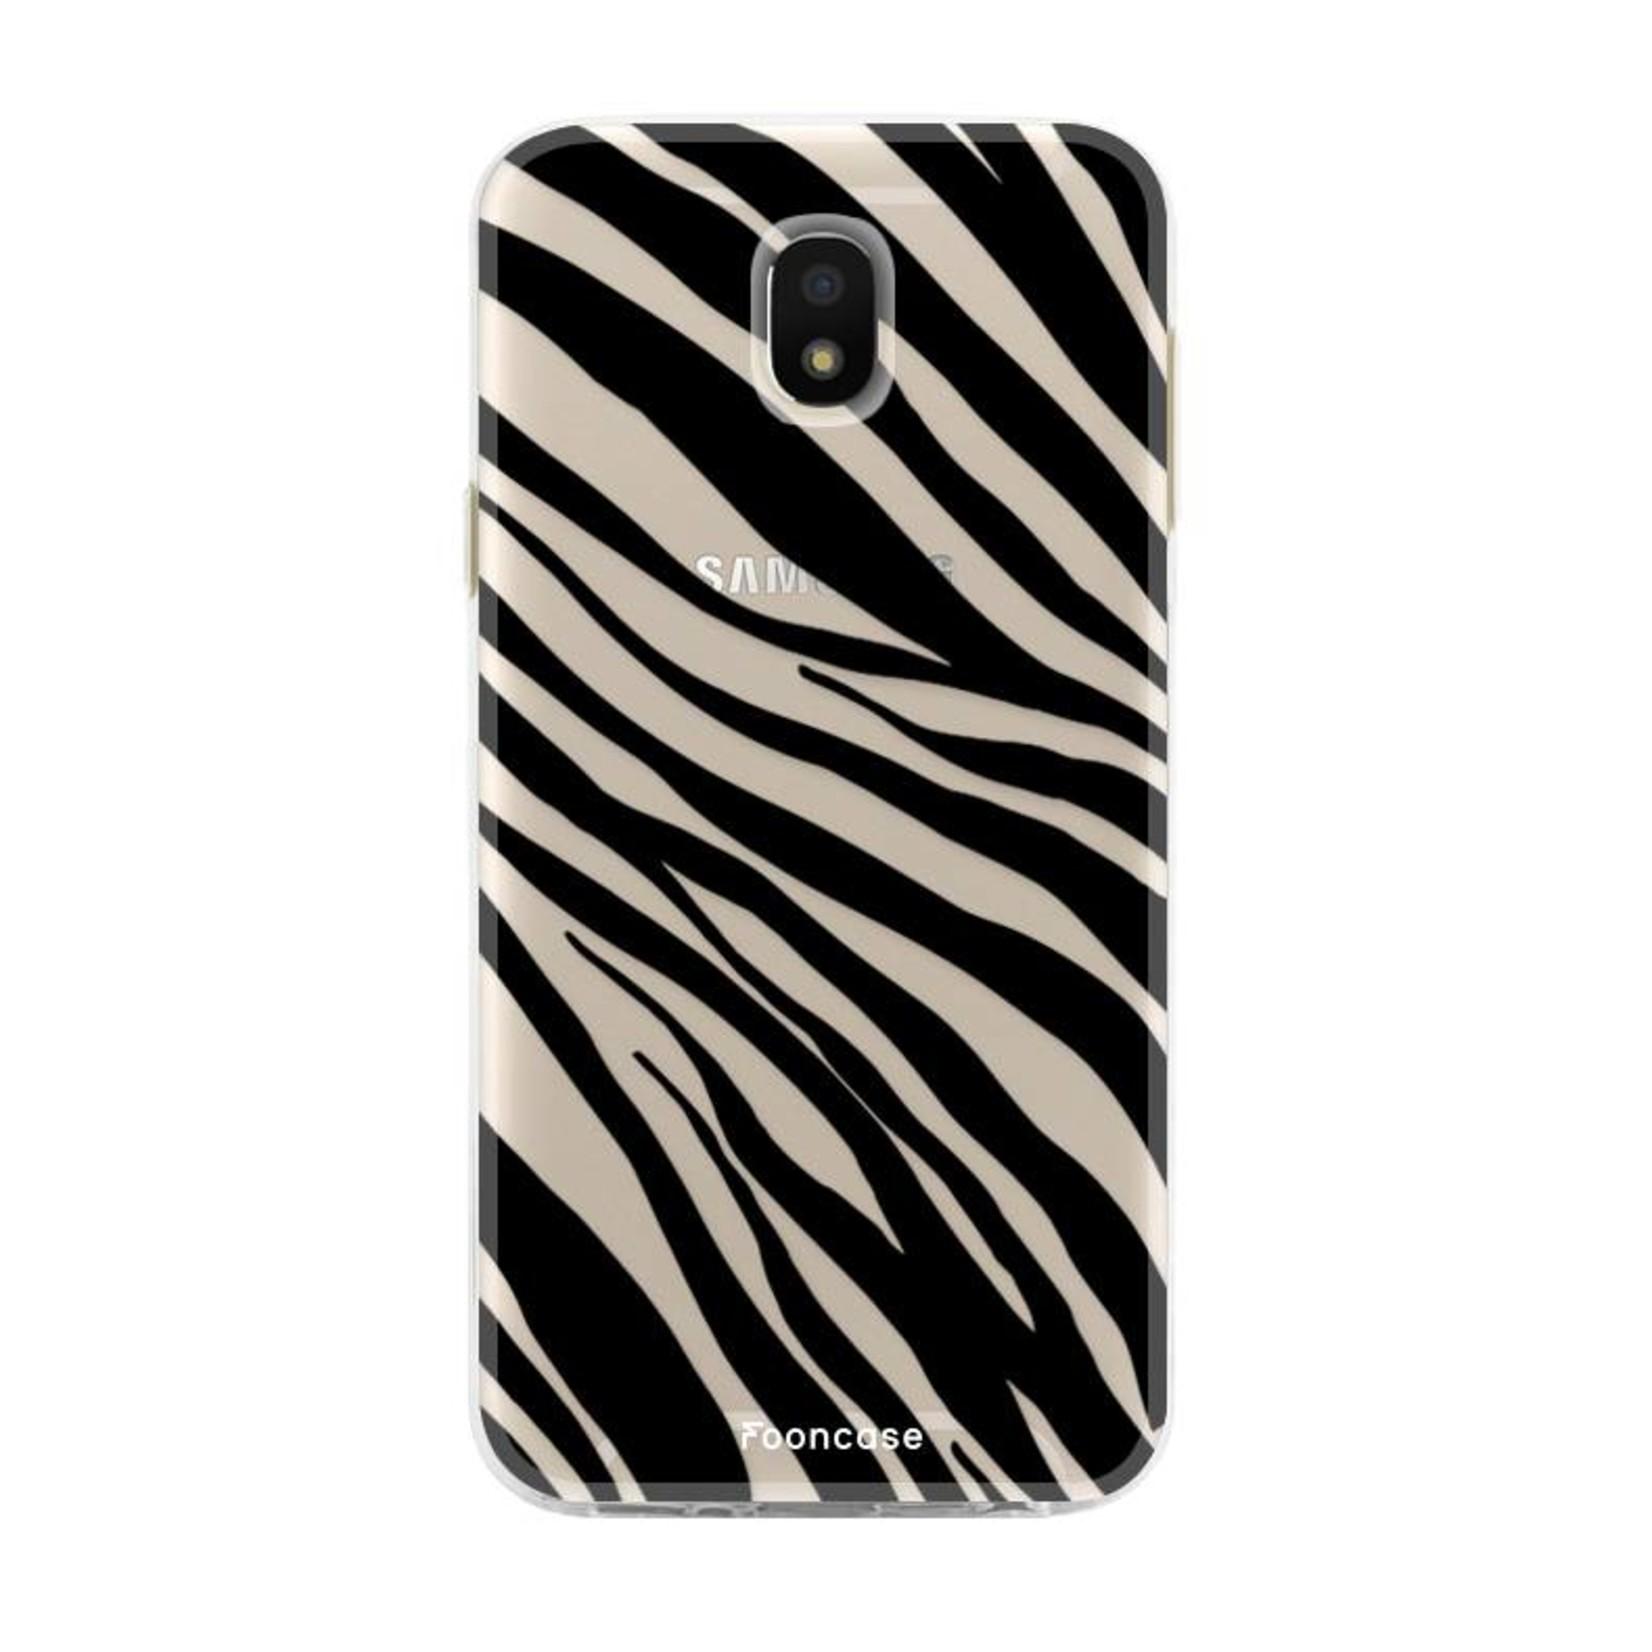 FOONCASE Samsung Galaxy J5 2017 - Zebra